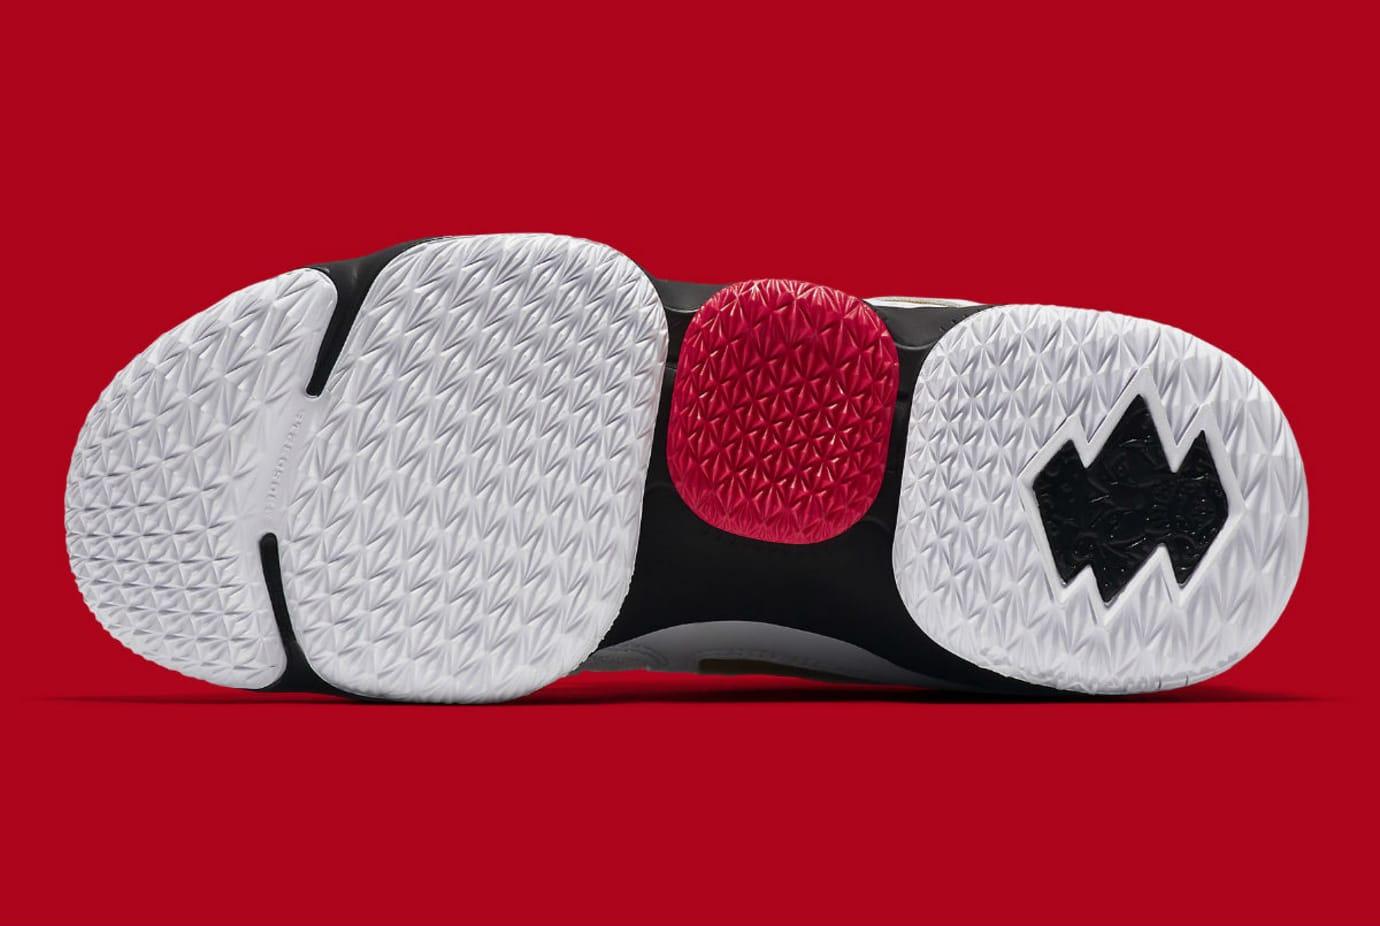 Nike LeBron 15 Diamond Turf Release Date AO9144-100 Sole